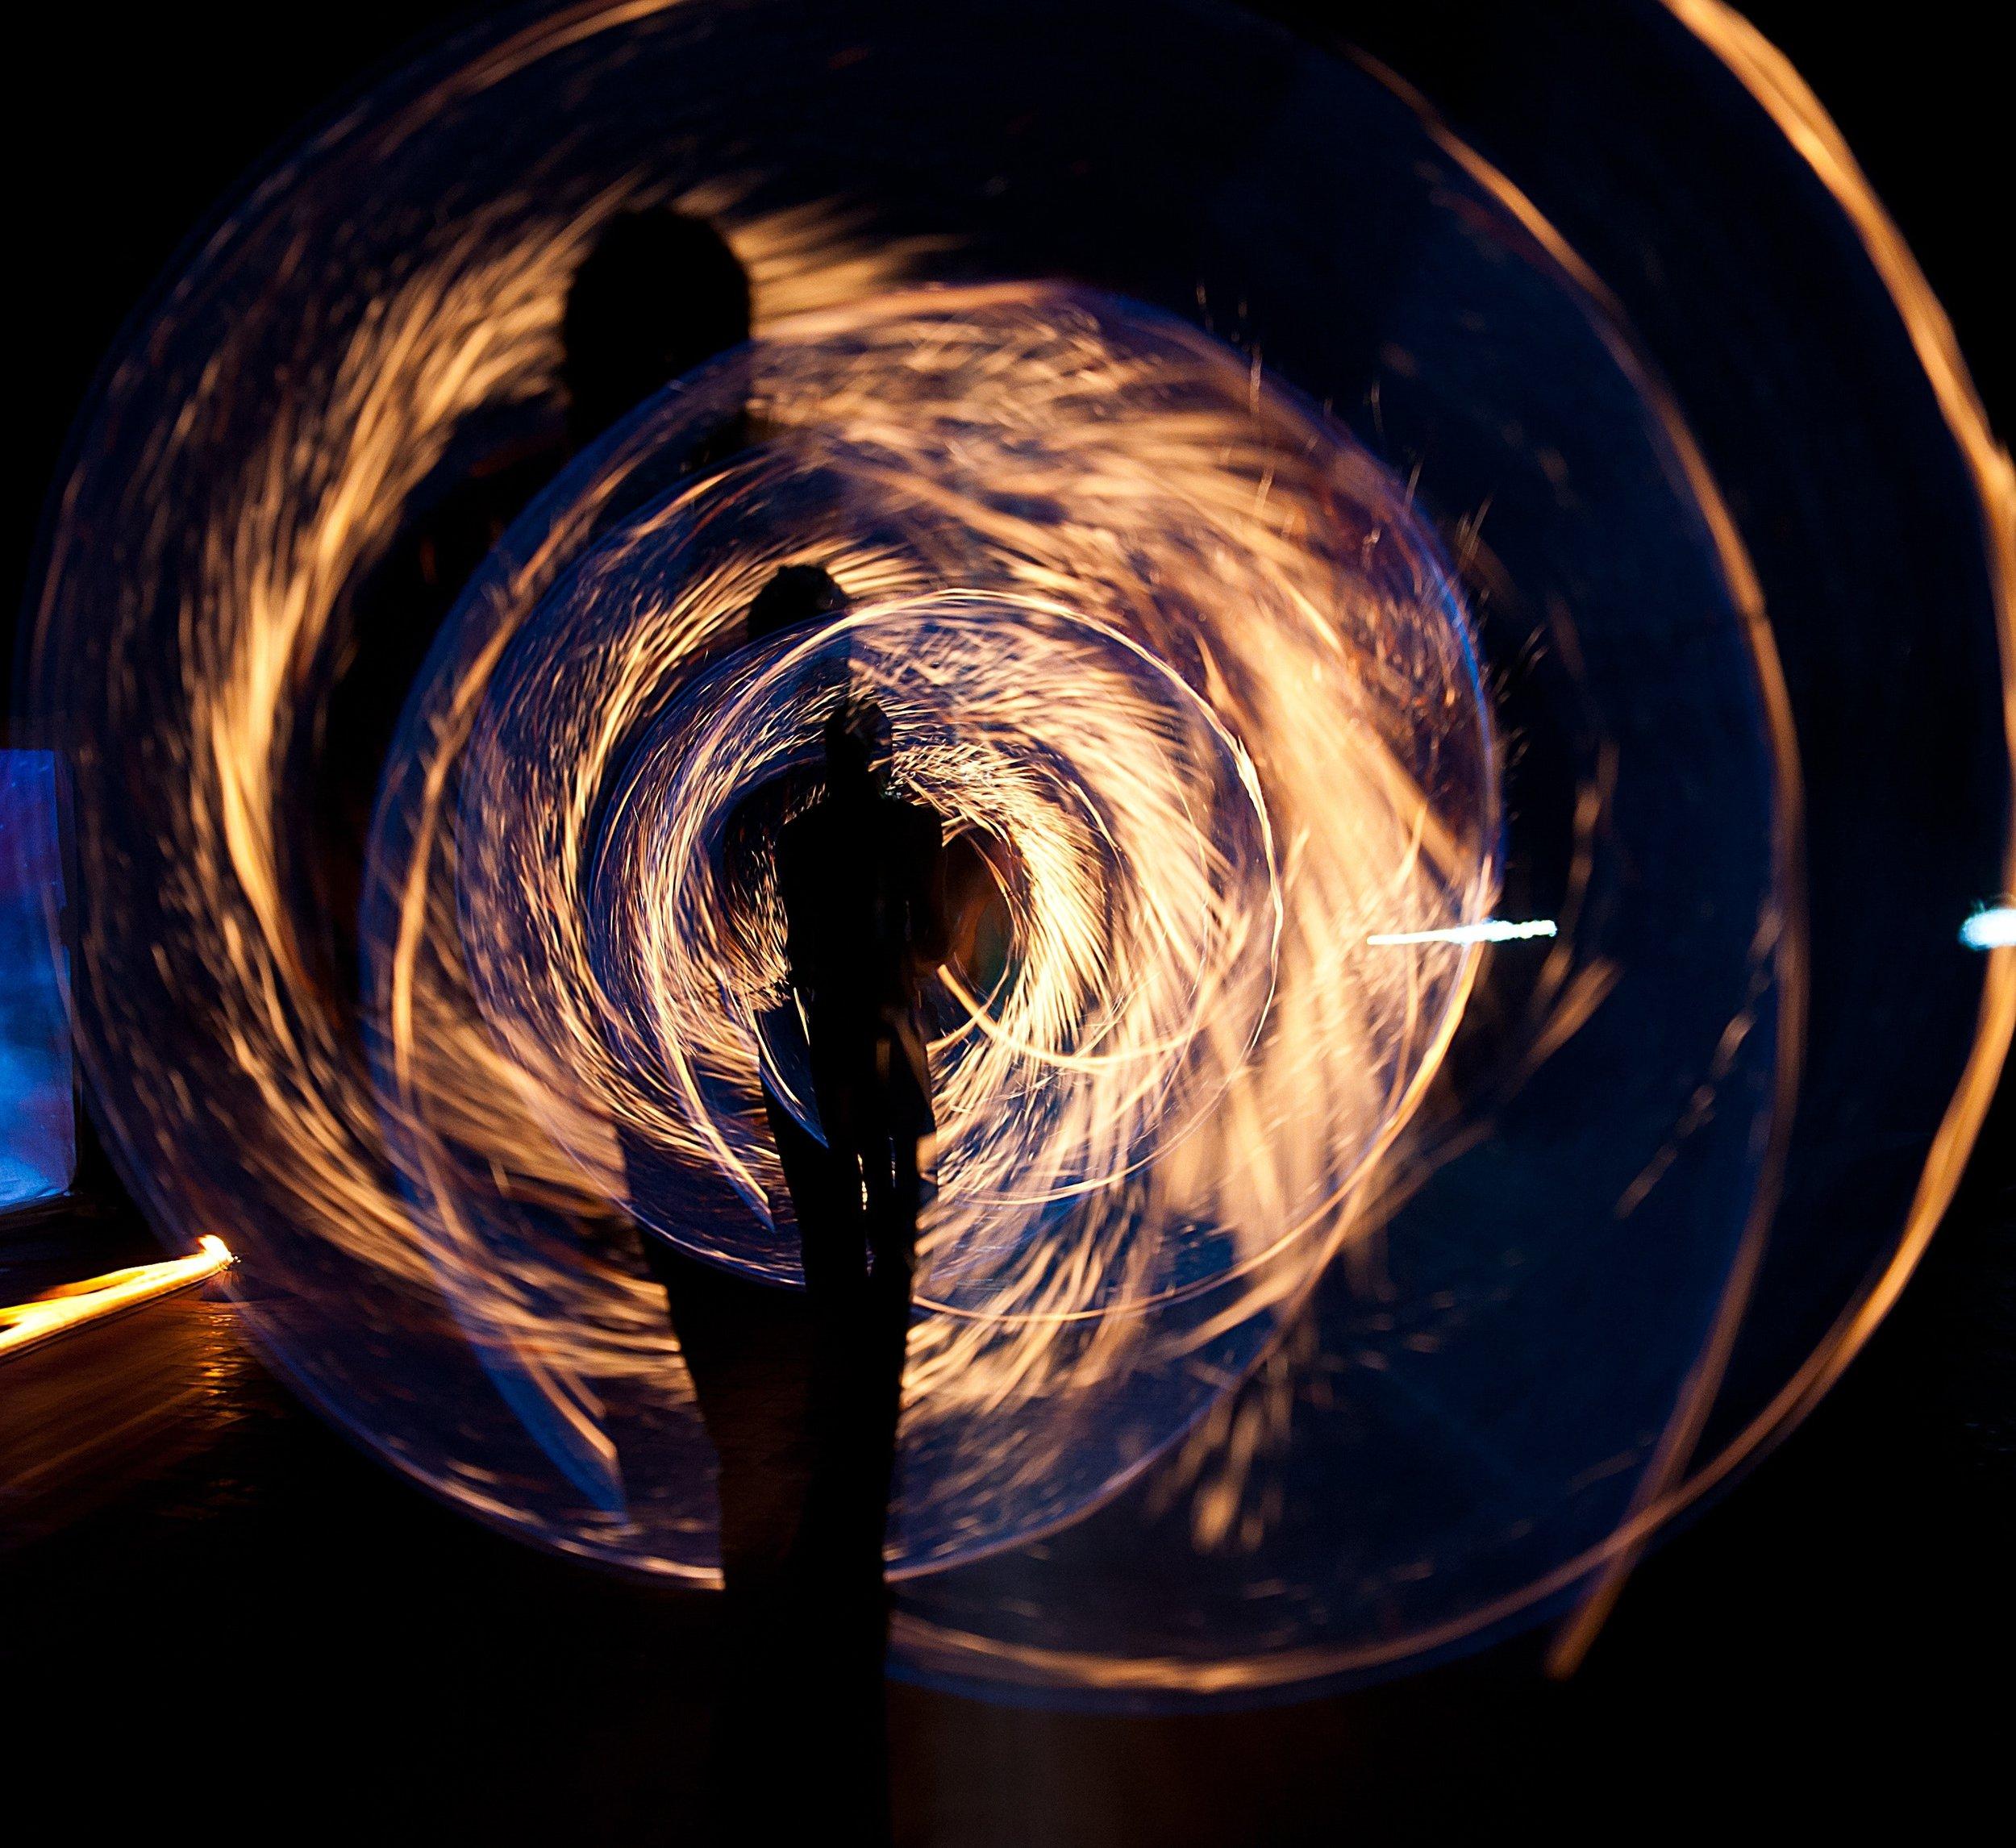 abstract-art-burnt-266429.jpg